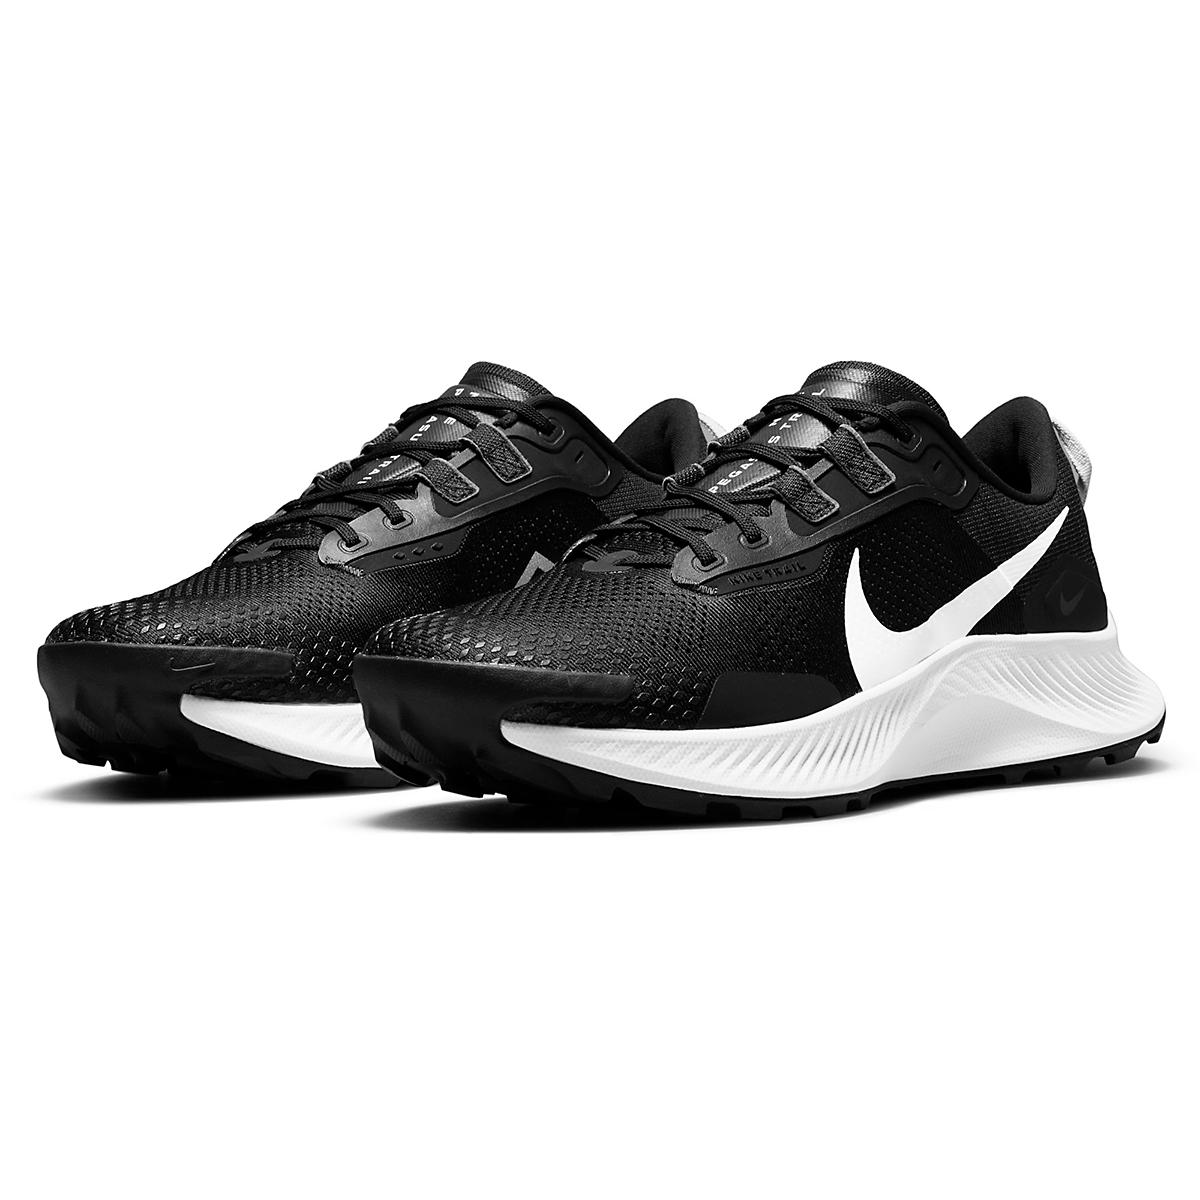 Men's Nike Pegasus Trail 3 Trail Running Shoe  - Color: Black/Pure Platinum/Dark Smoke Grey  - Size: 6 - Width: Regular, Black/Pure Platinum/Dark Smoke Grey, large, image 7